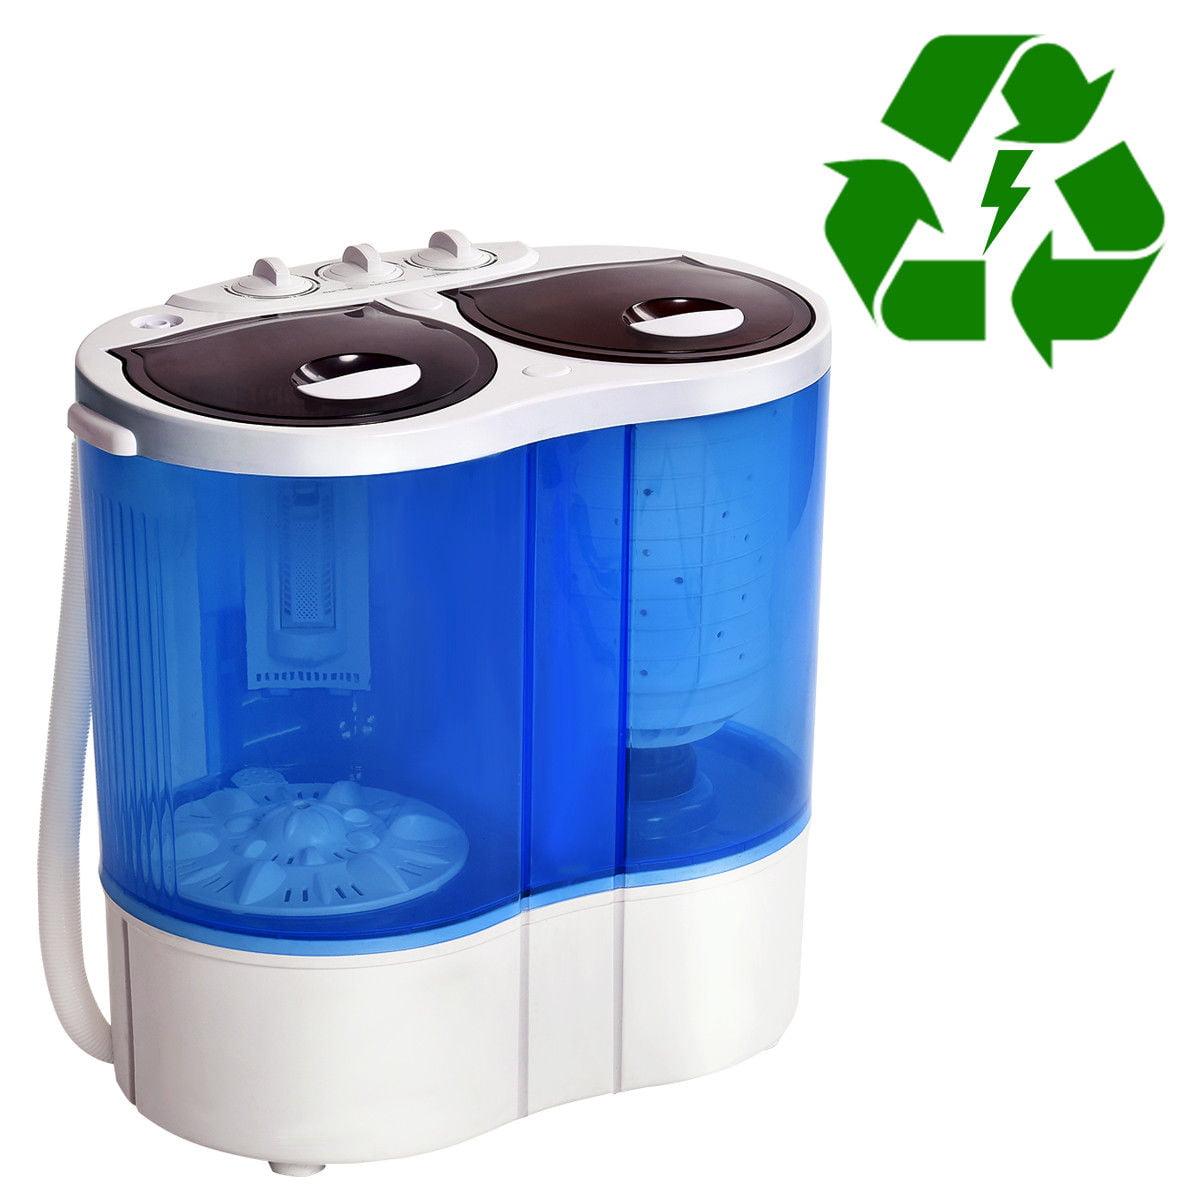 Costway Portable Mini Washing Machine Compact Twin Tub 15 ...